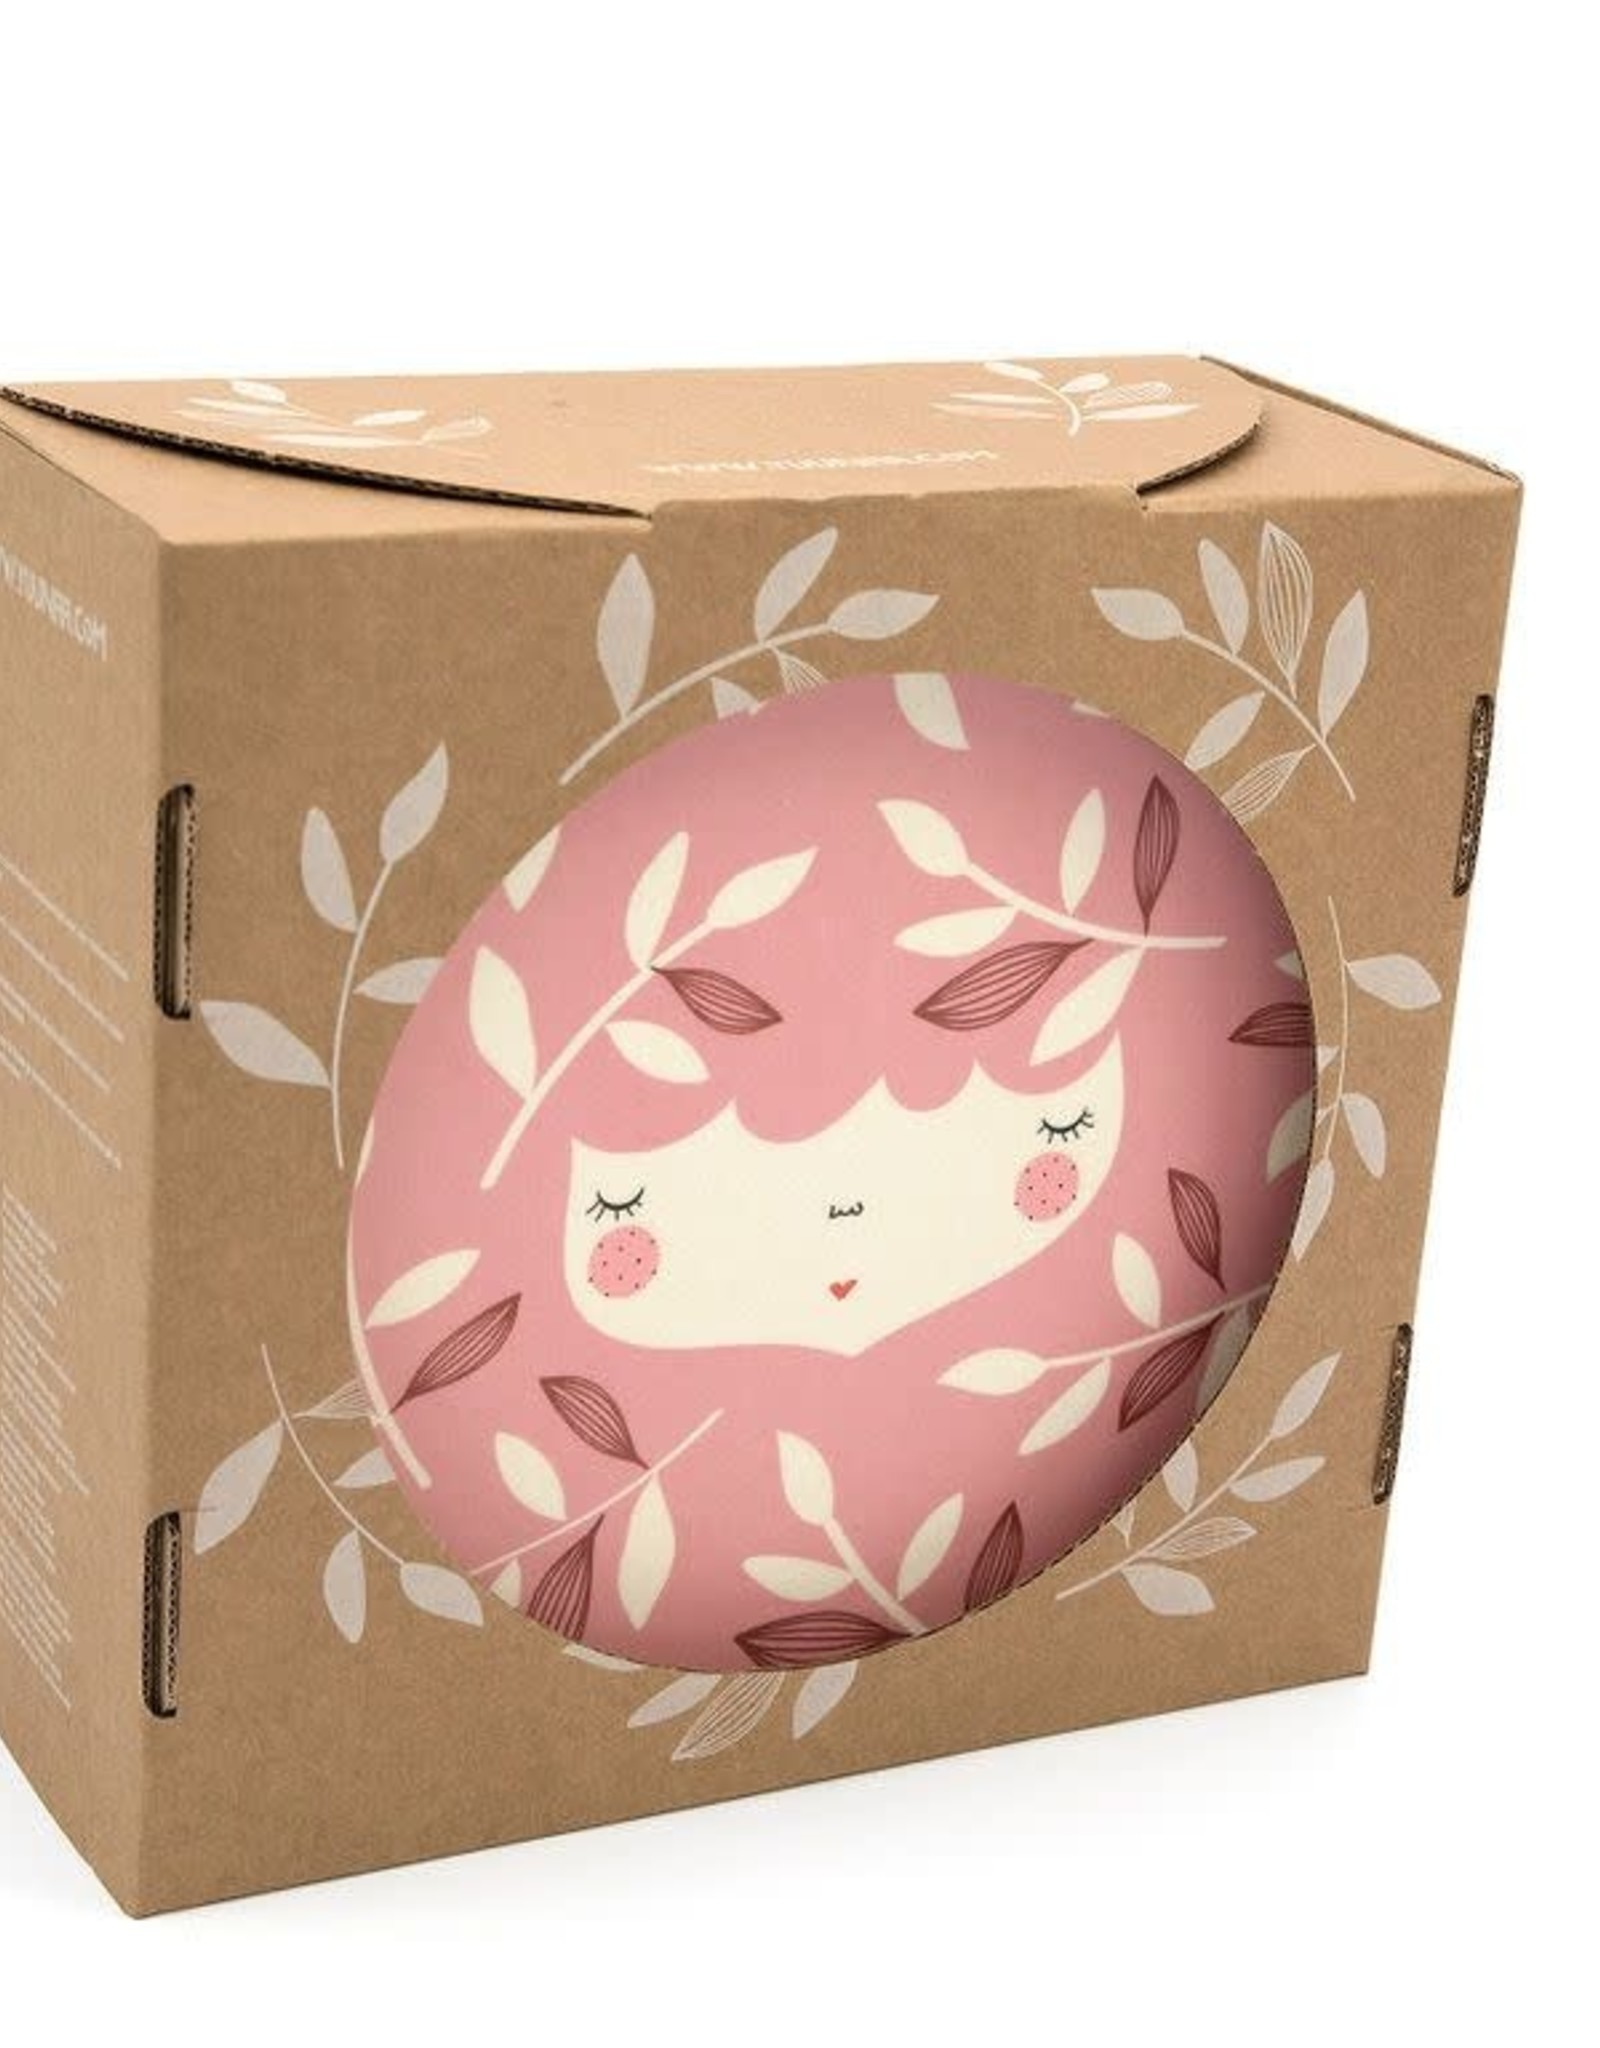 Yuunaa Bamboo Kids Set - Marinska Flower Face Pink - 3 pieces